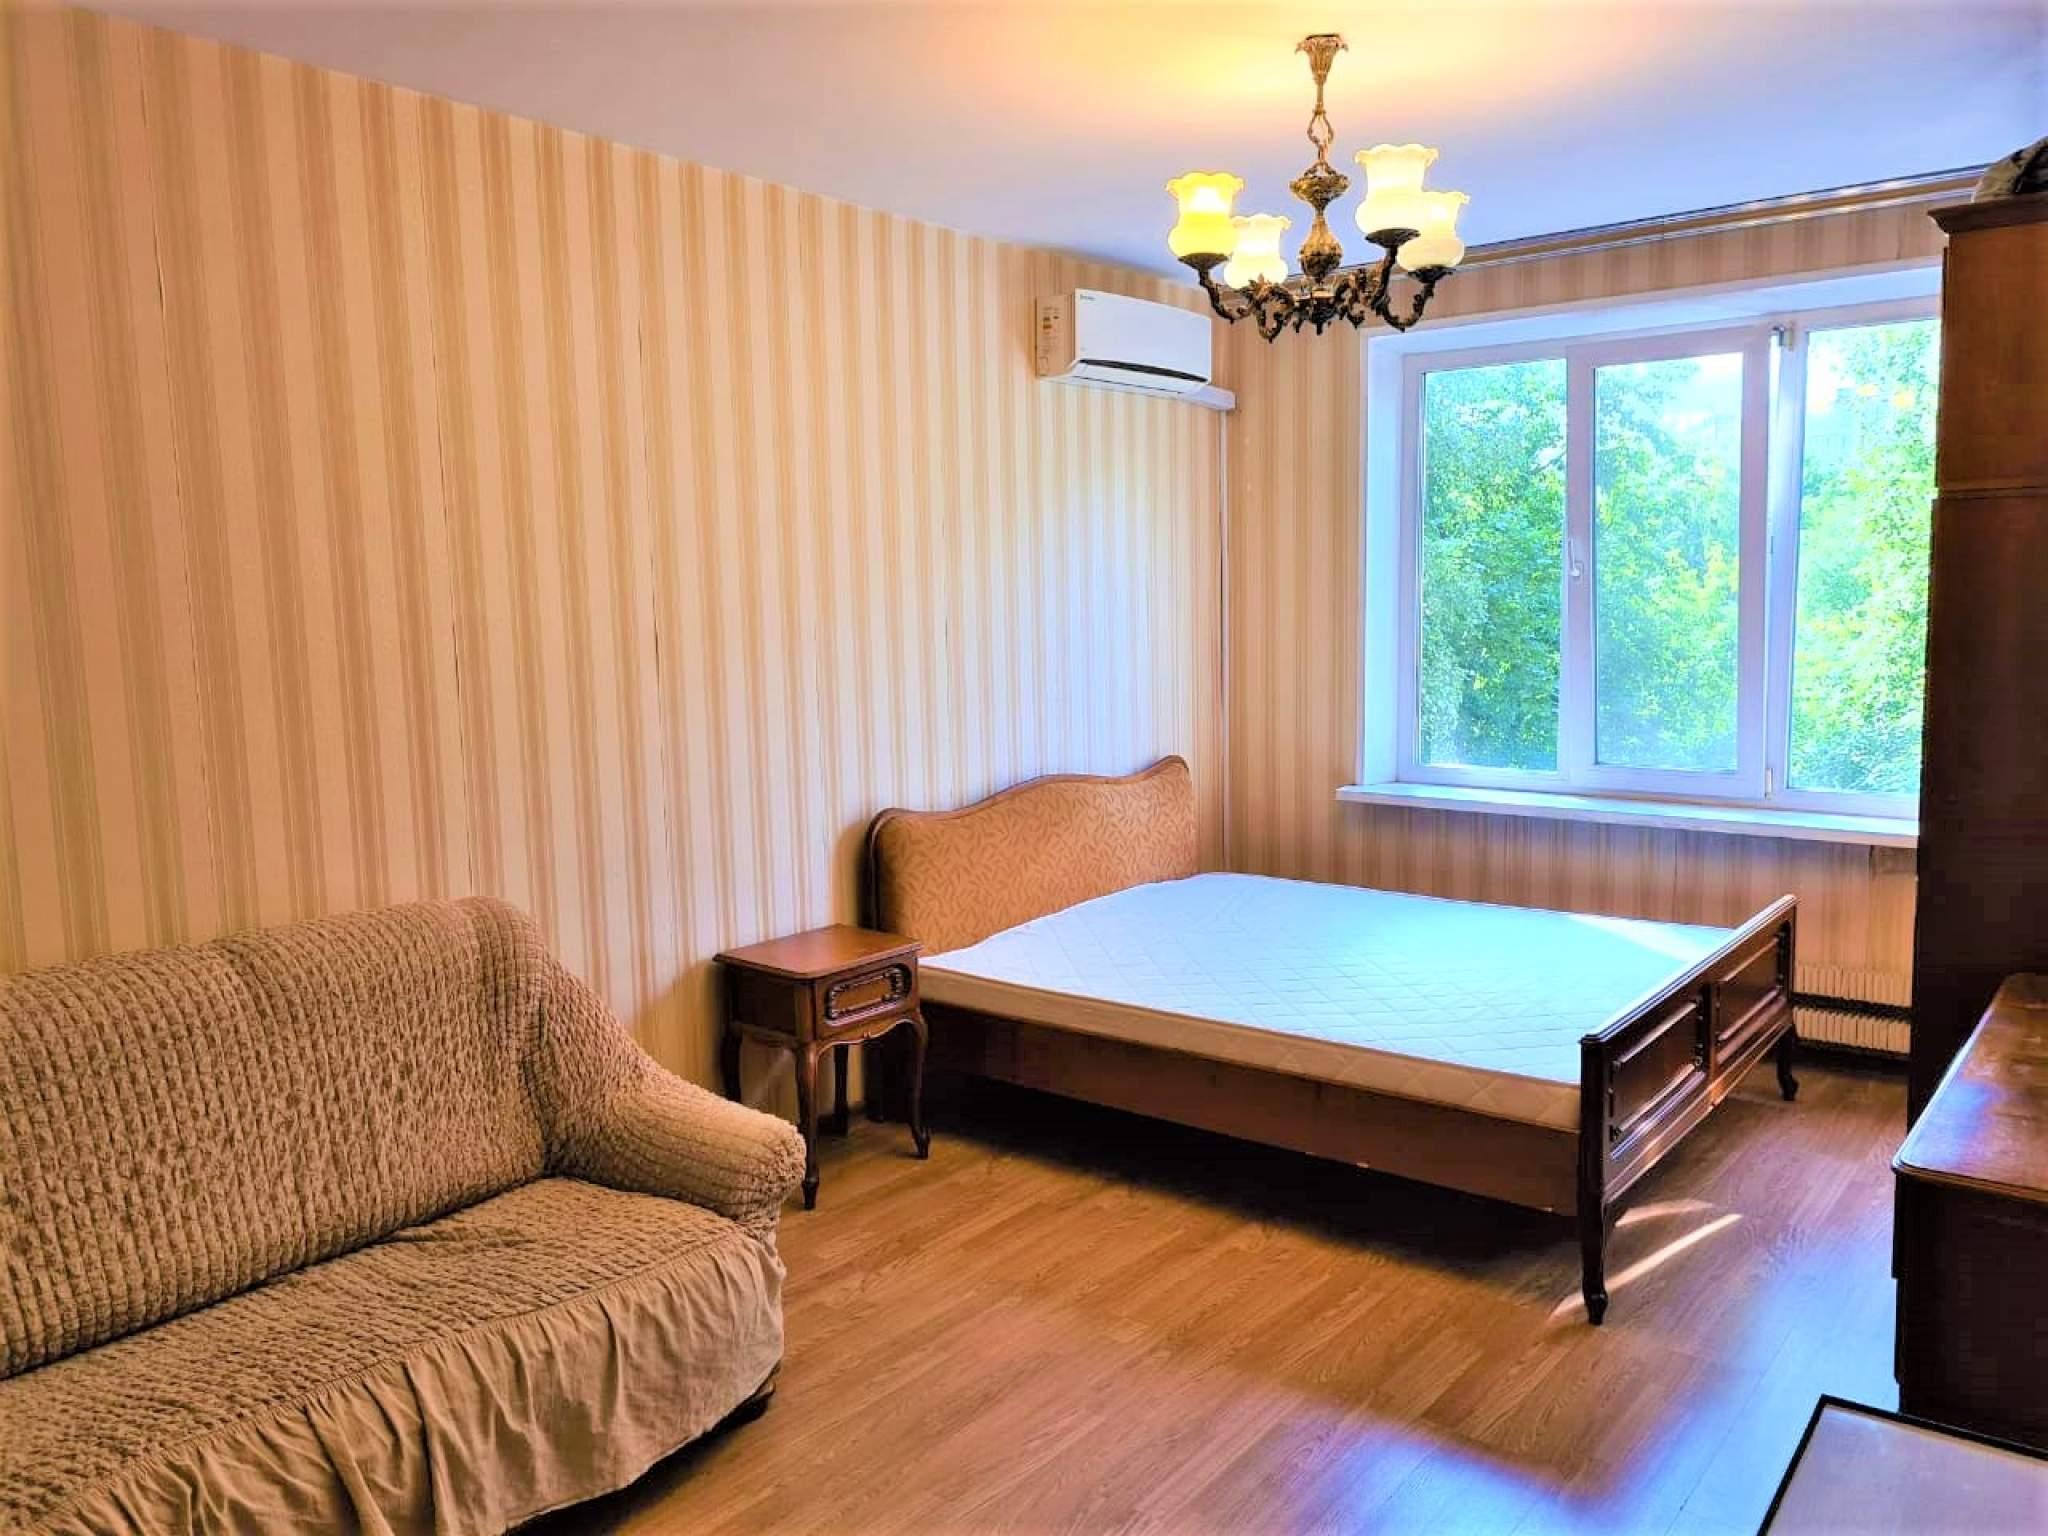 Продажа 1-комнатной квартиры, Москва, Старый Гай улица,  д.1к2